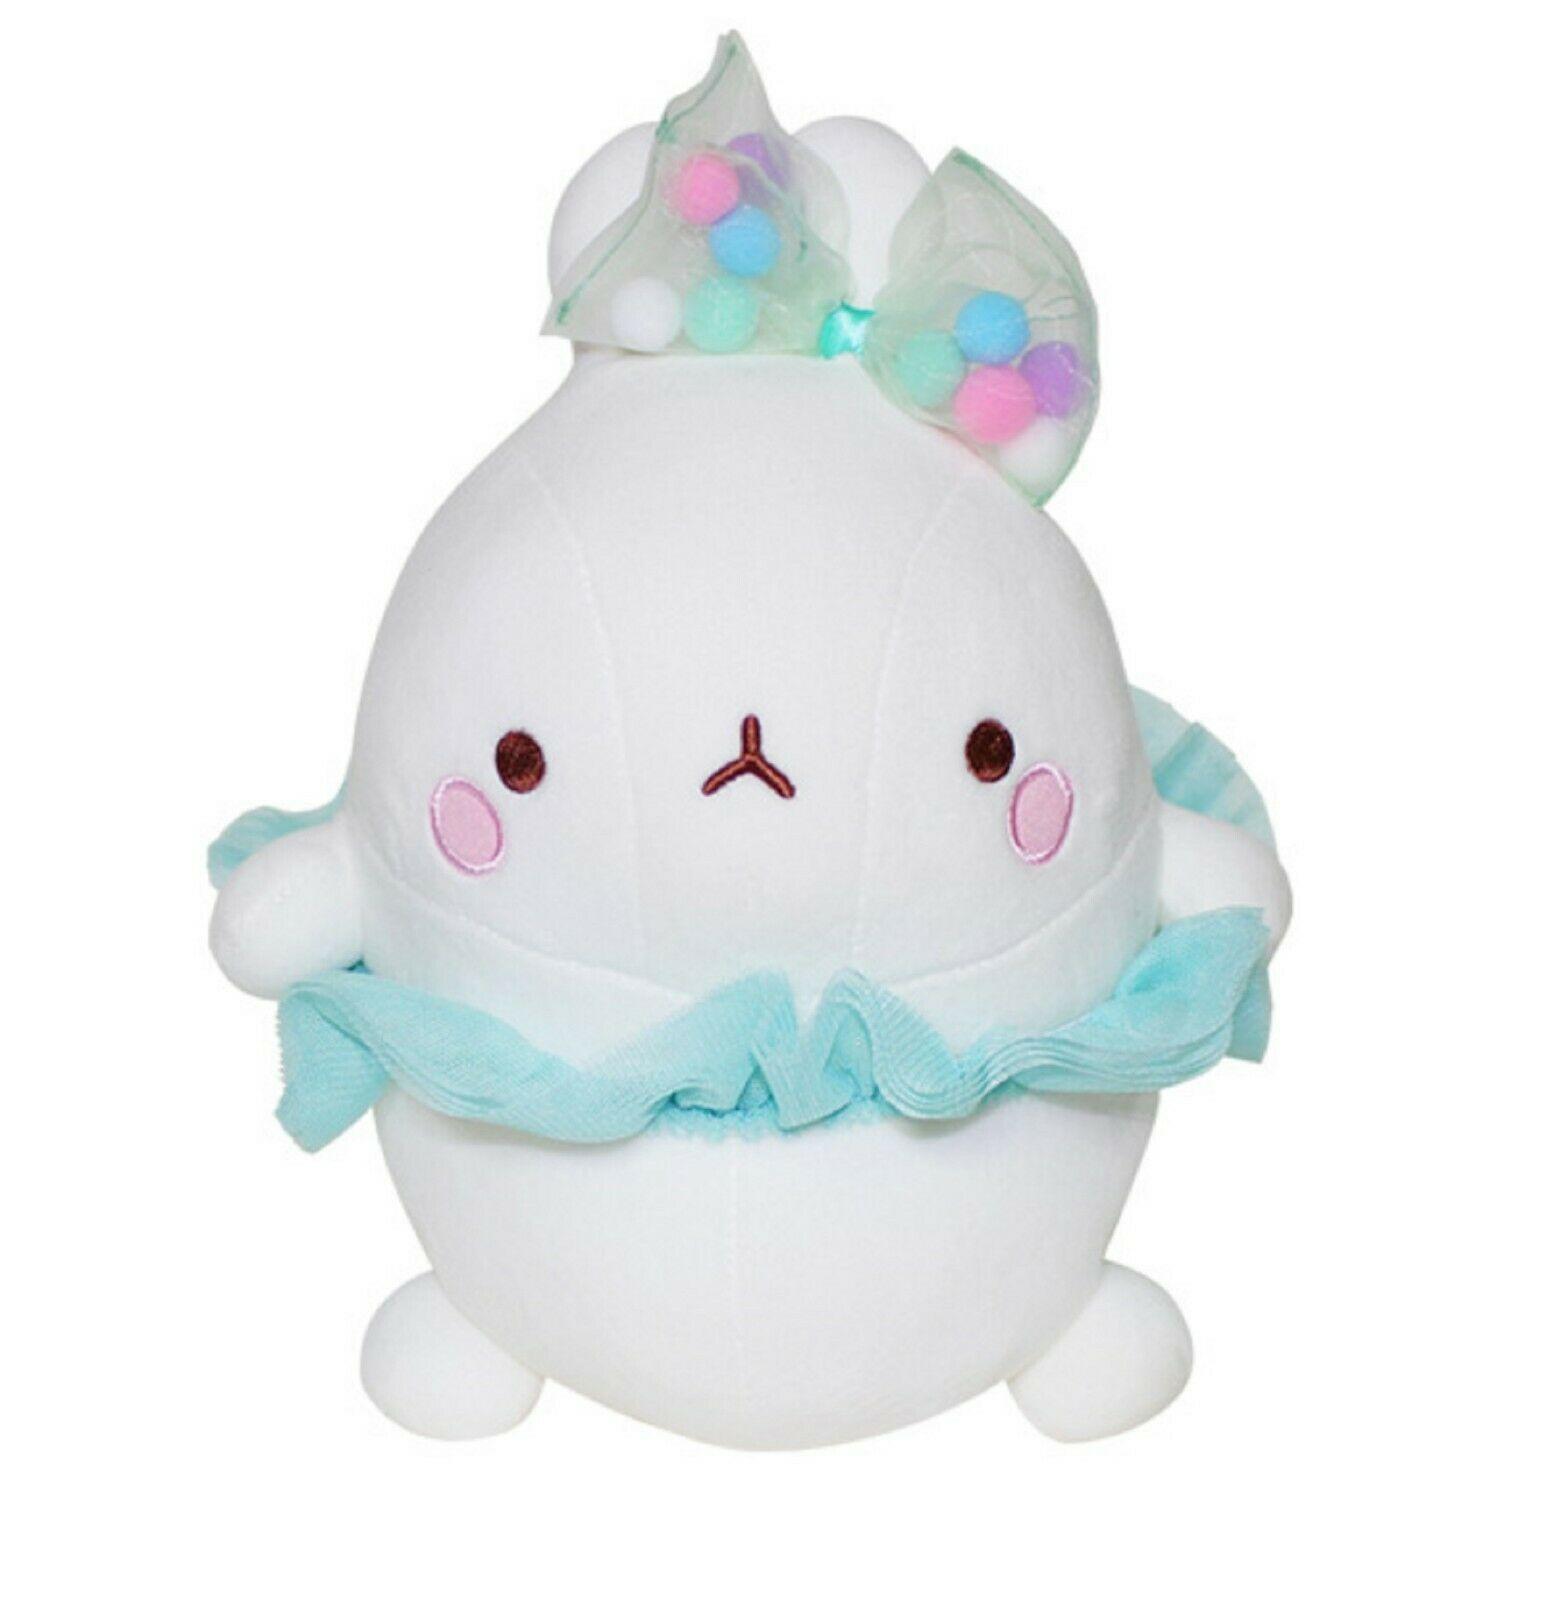 "Molang Ballerina Ballet Costume Rabbit Stuffed Animal Plush Pet Toy Cushion 9.8"""